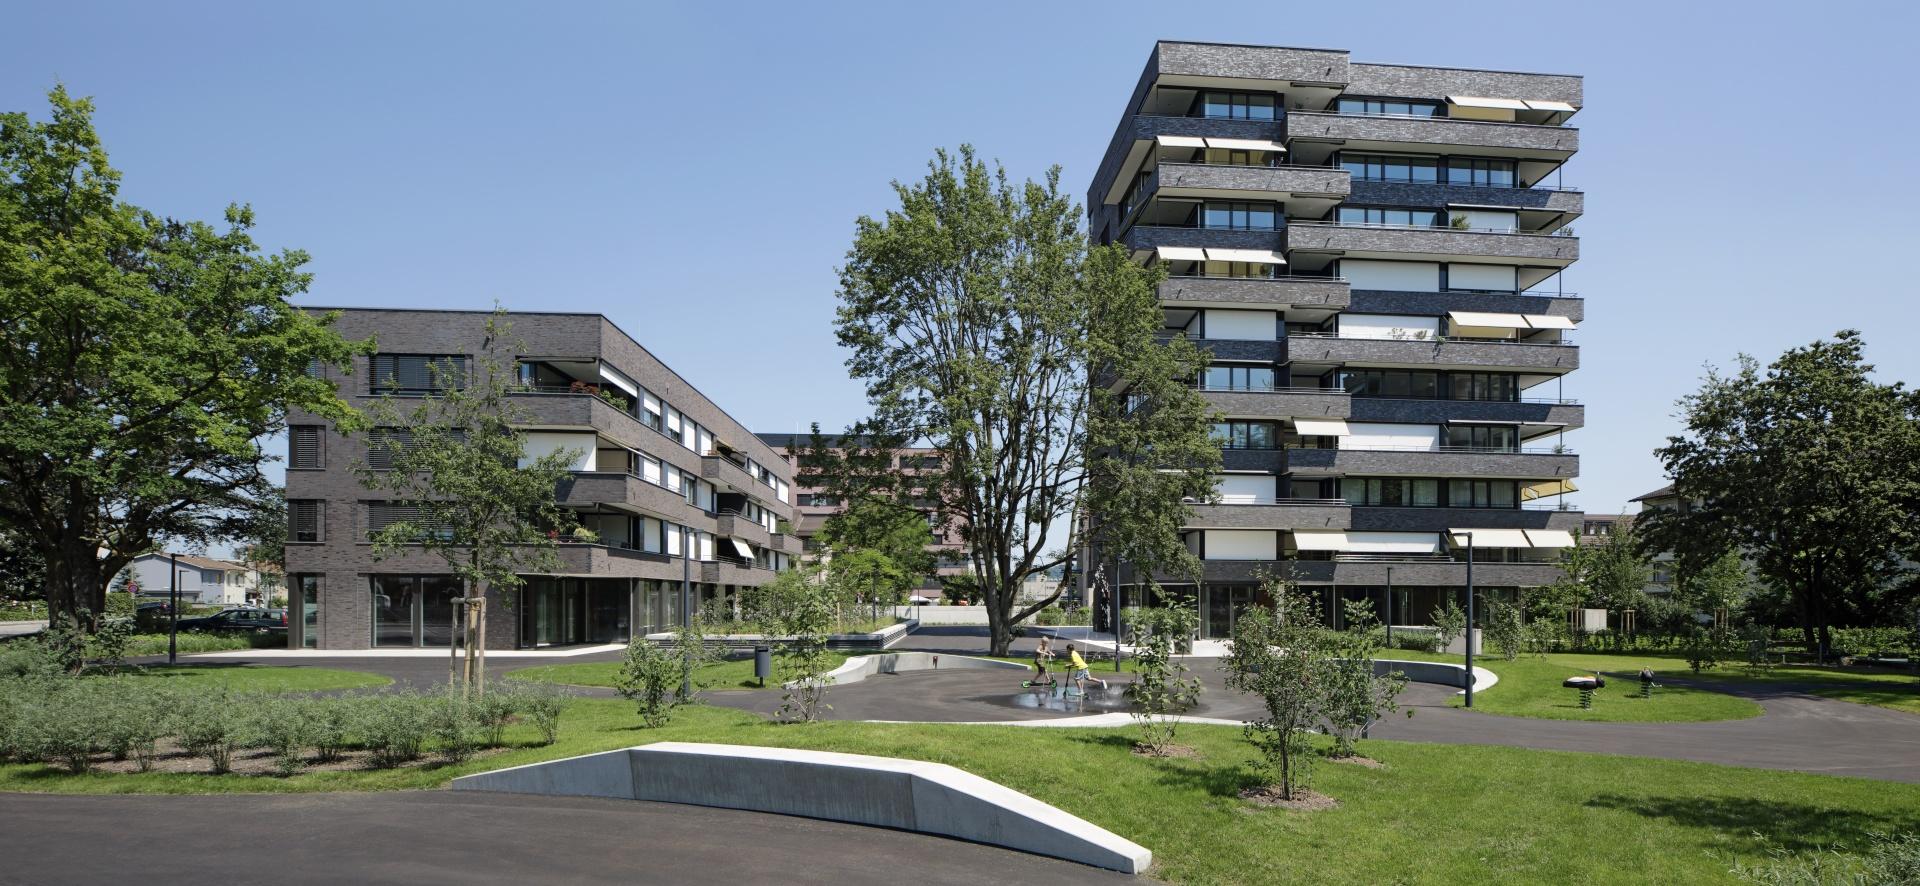 Lutzertgarten_Fassade_Süd © Tom Bisig, Basel